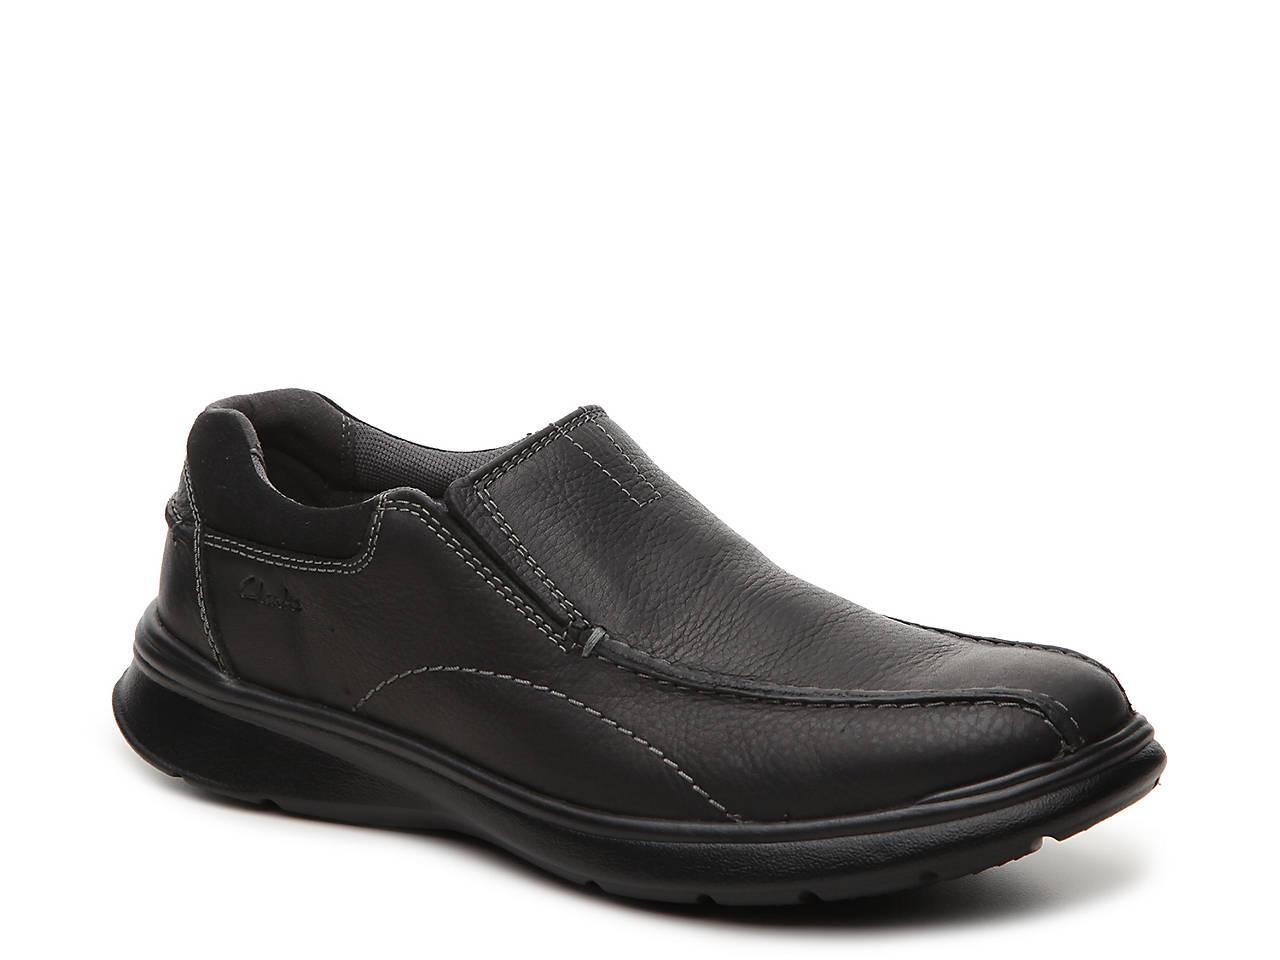 053ac3ef058 Clarks Cotrell Step Slip-On Men s Shoes